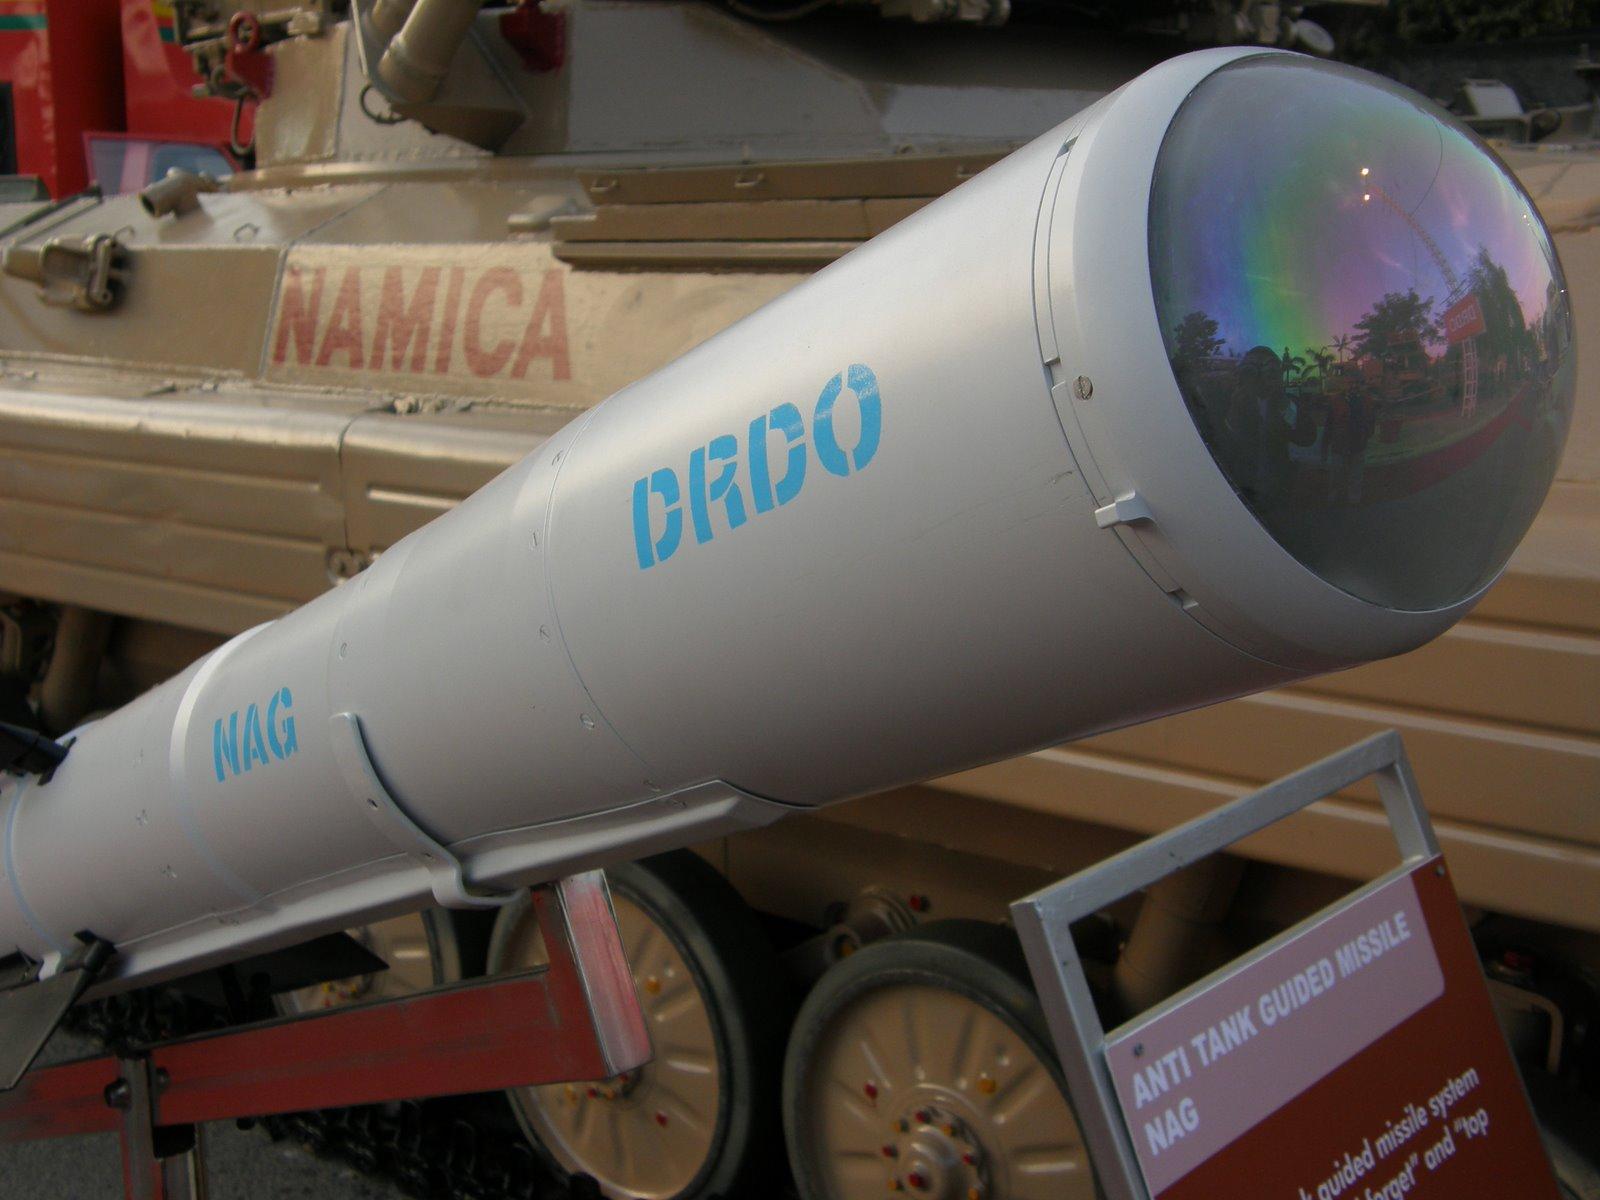 Nag_missile_closeup.JPG